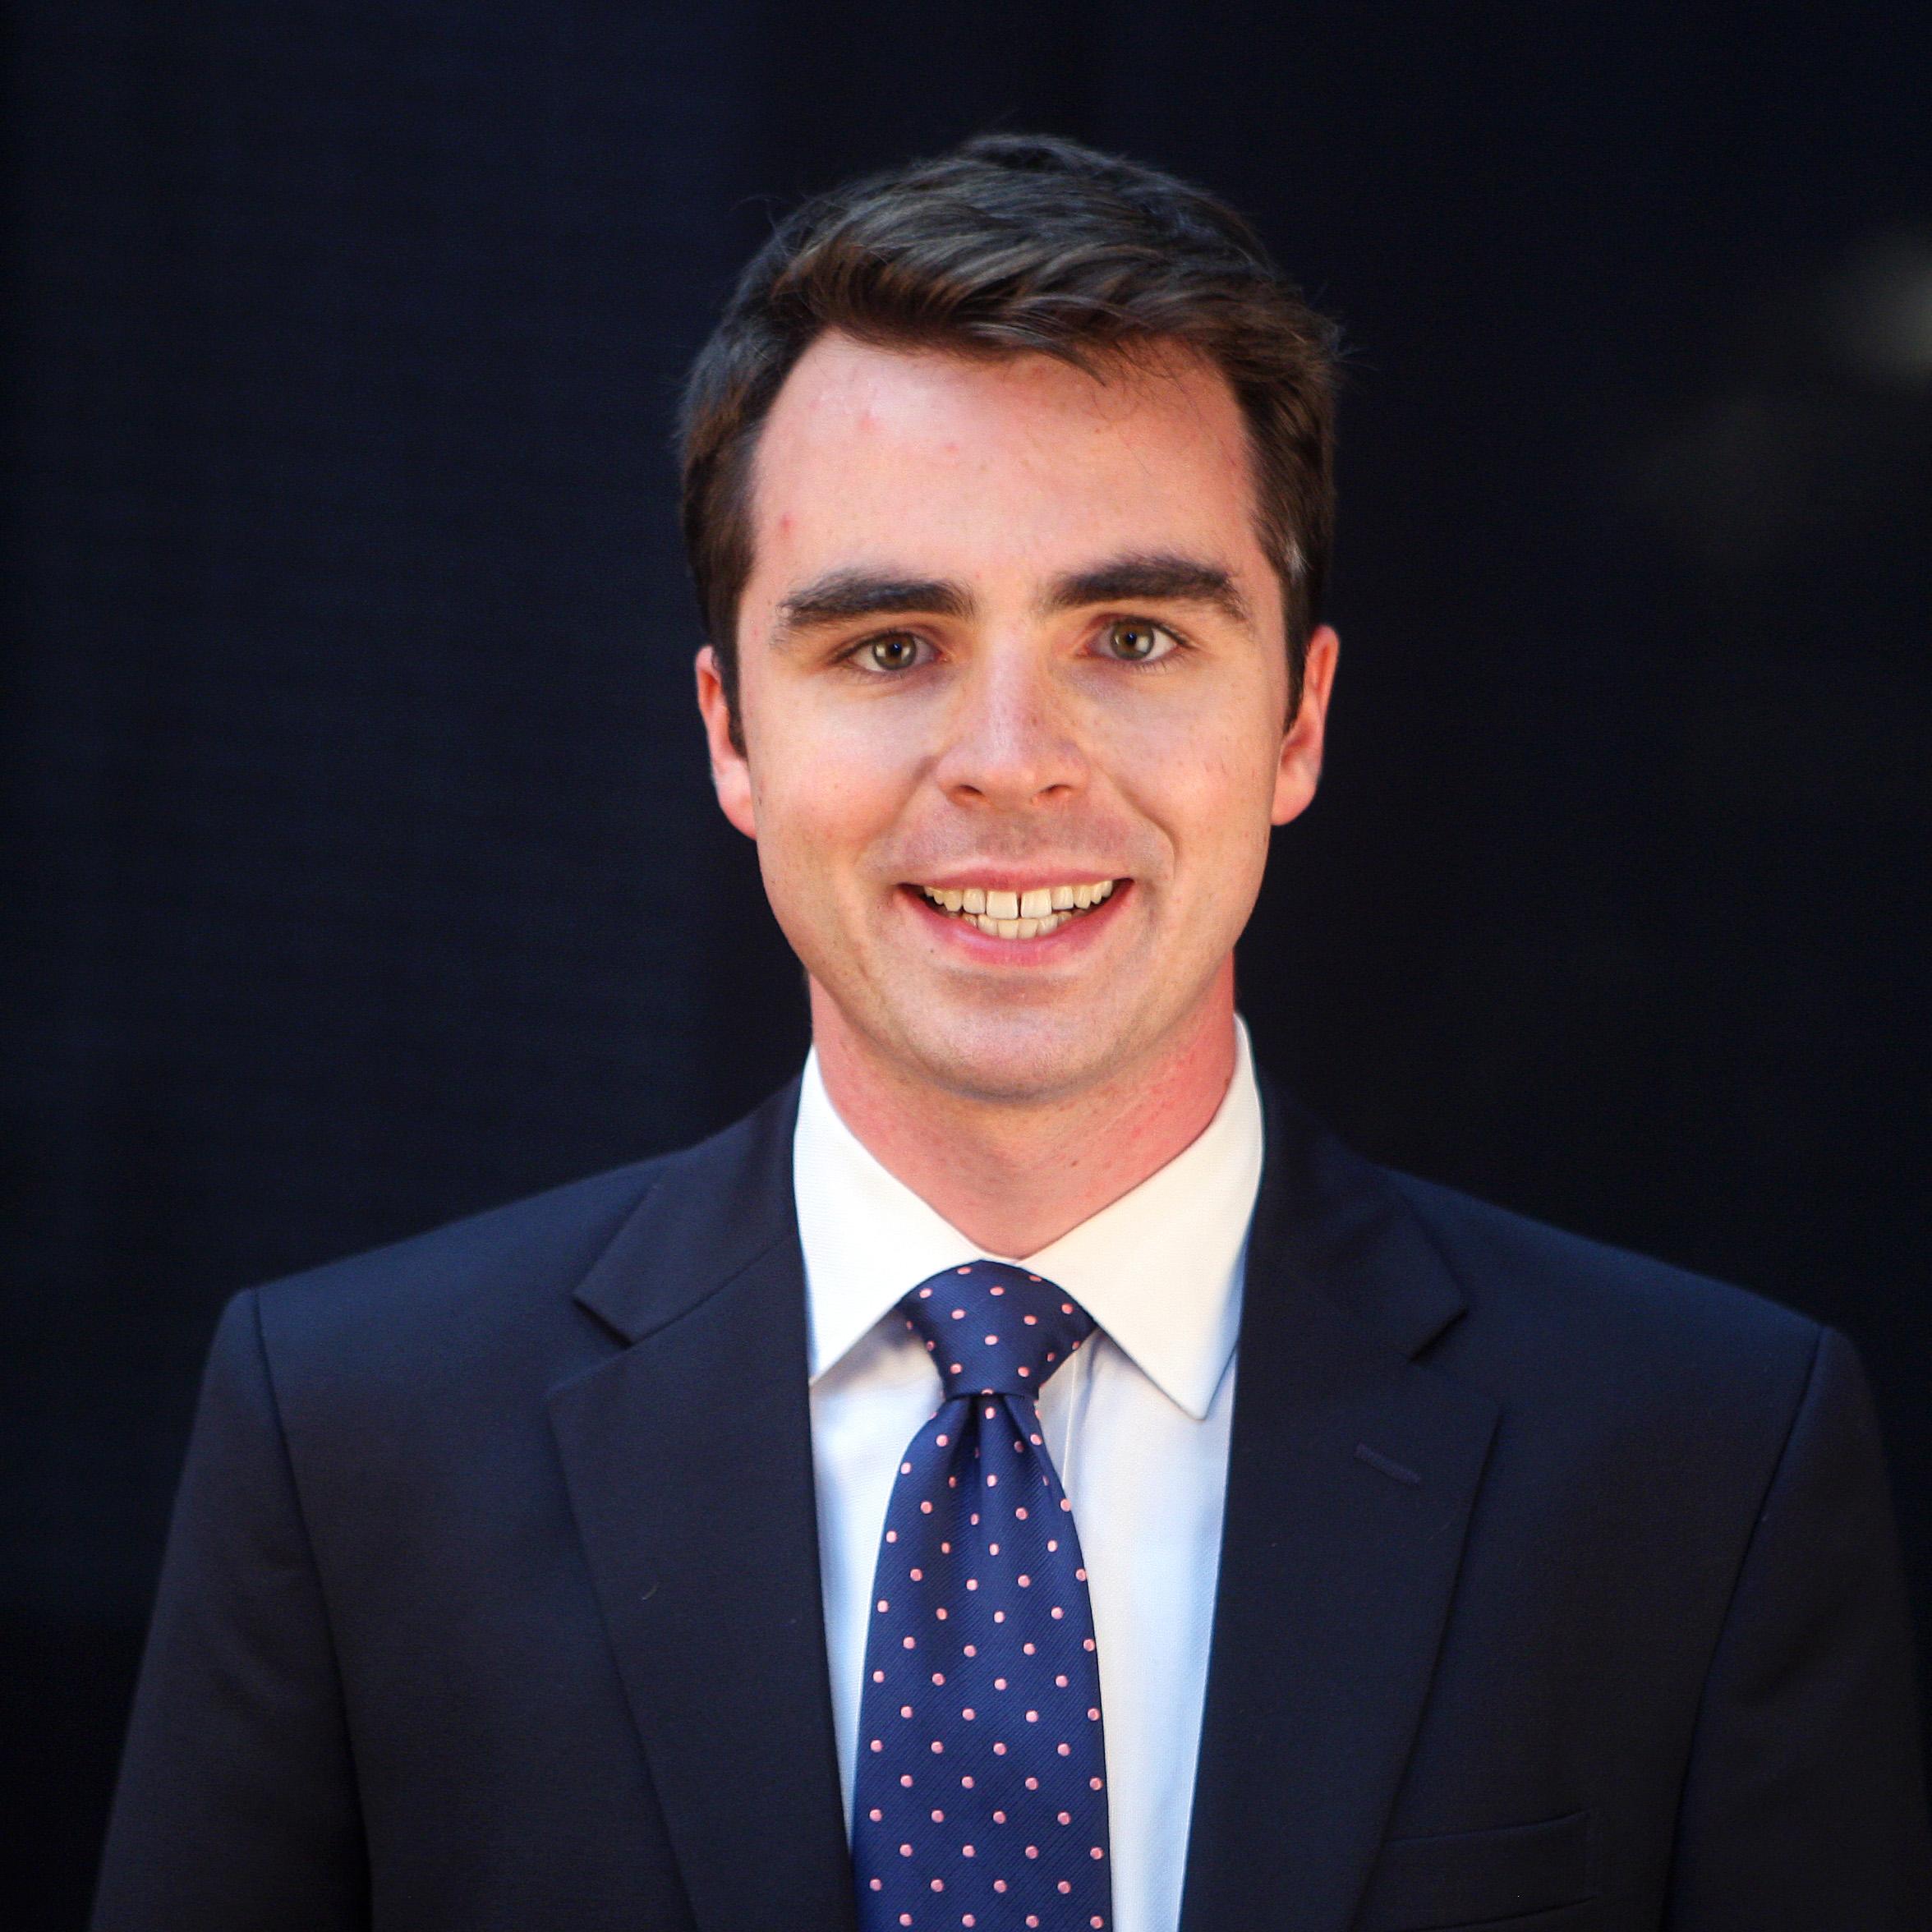 Matthew Zahn